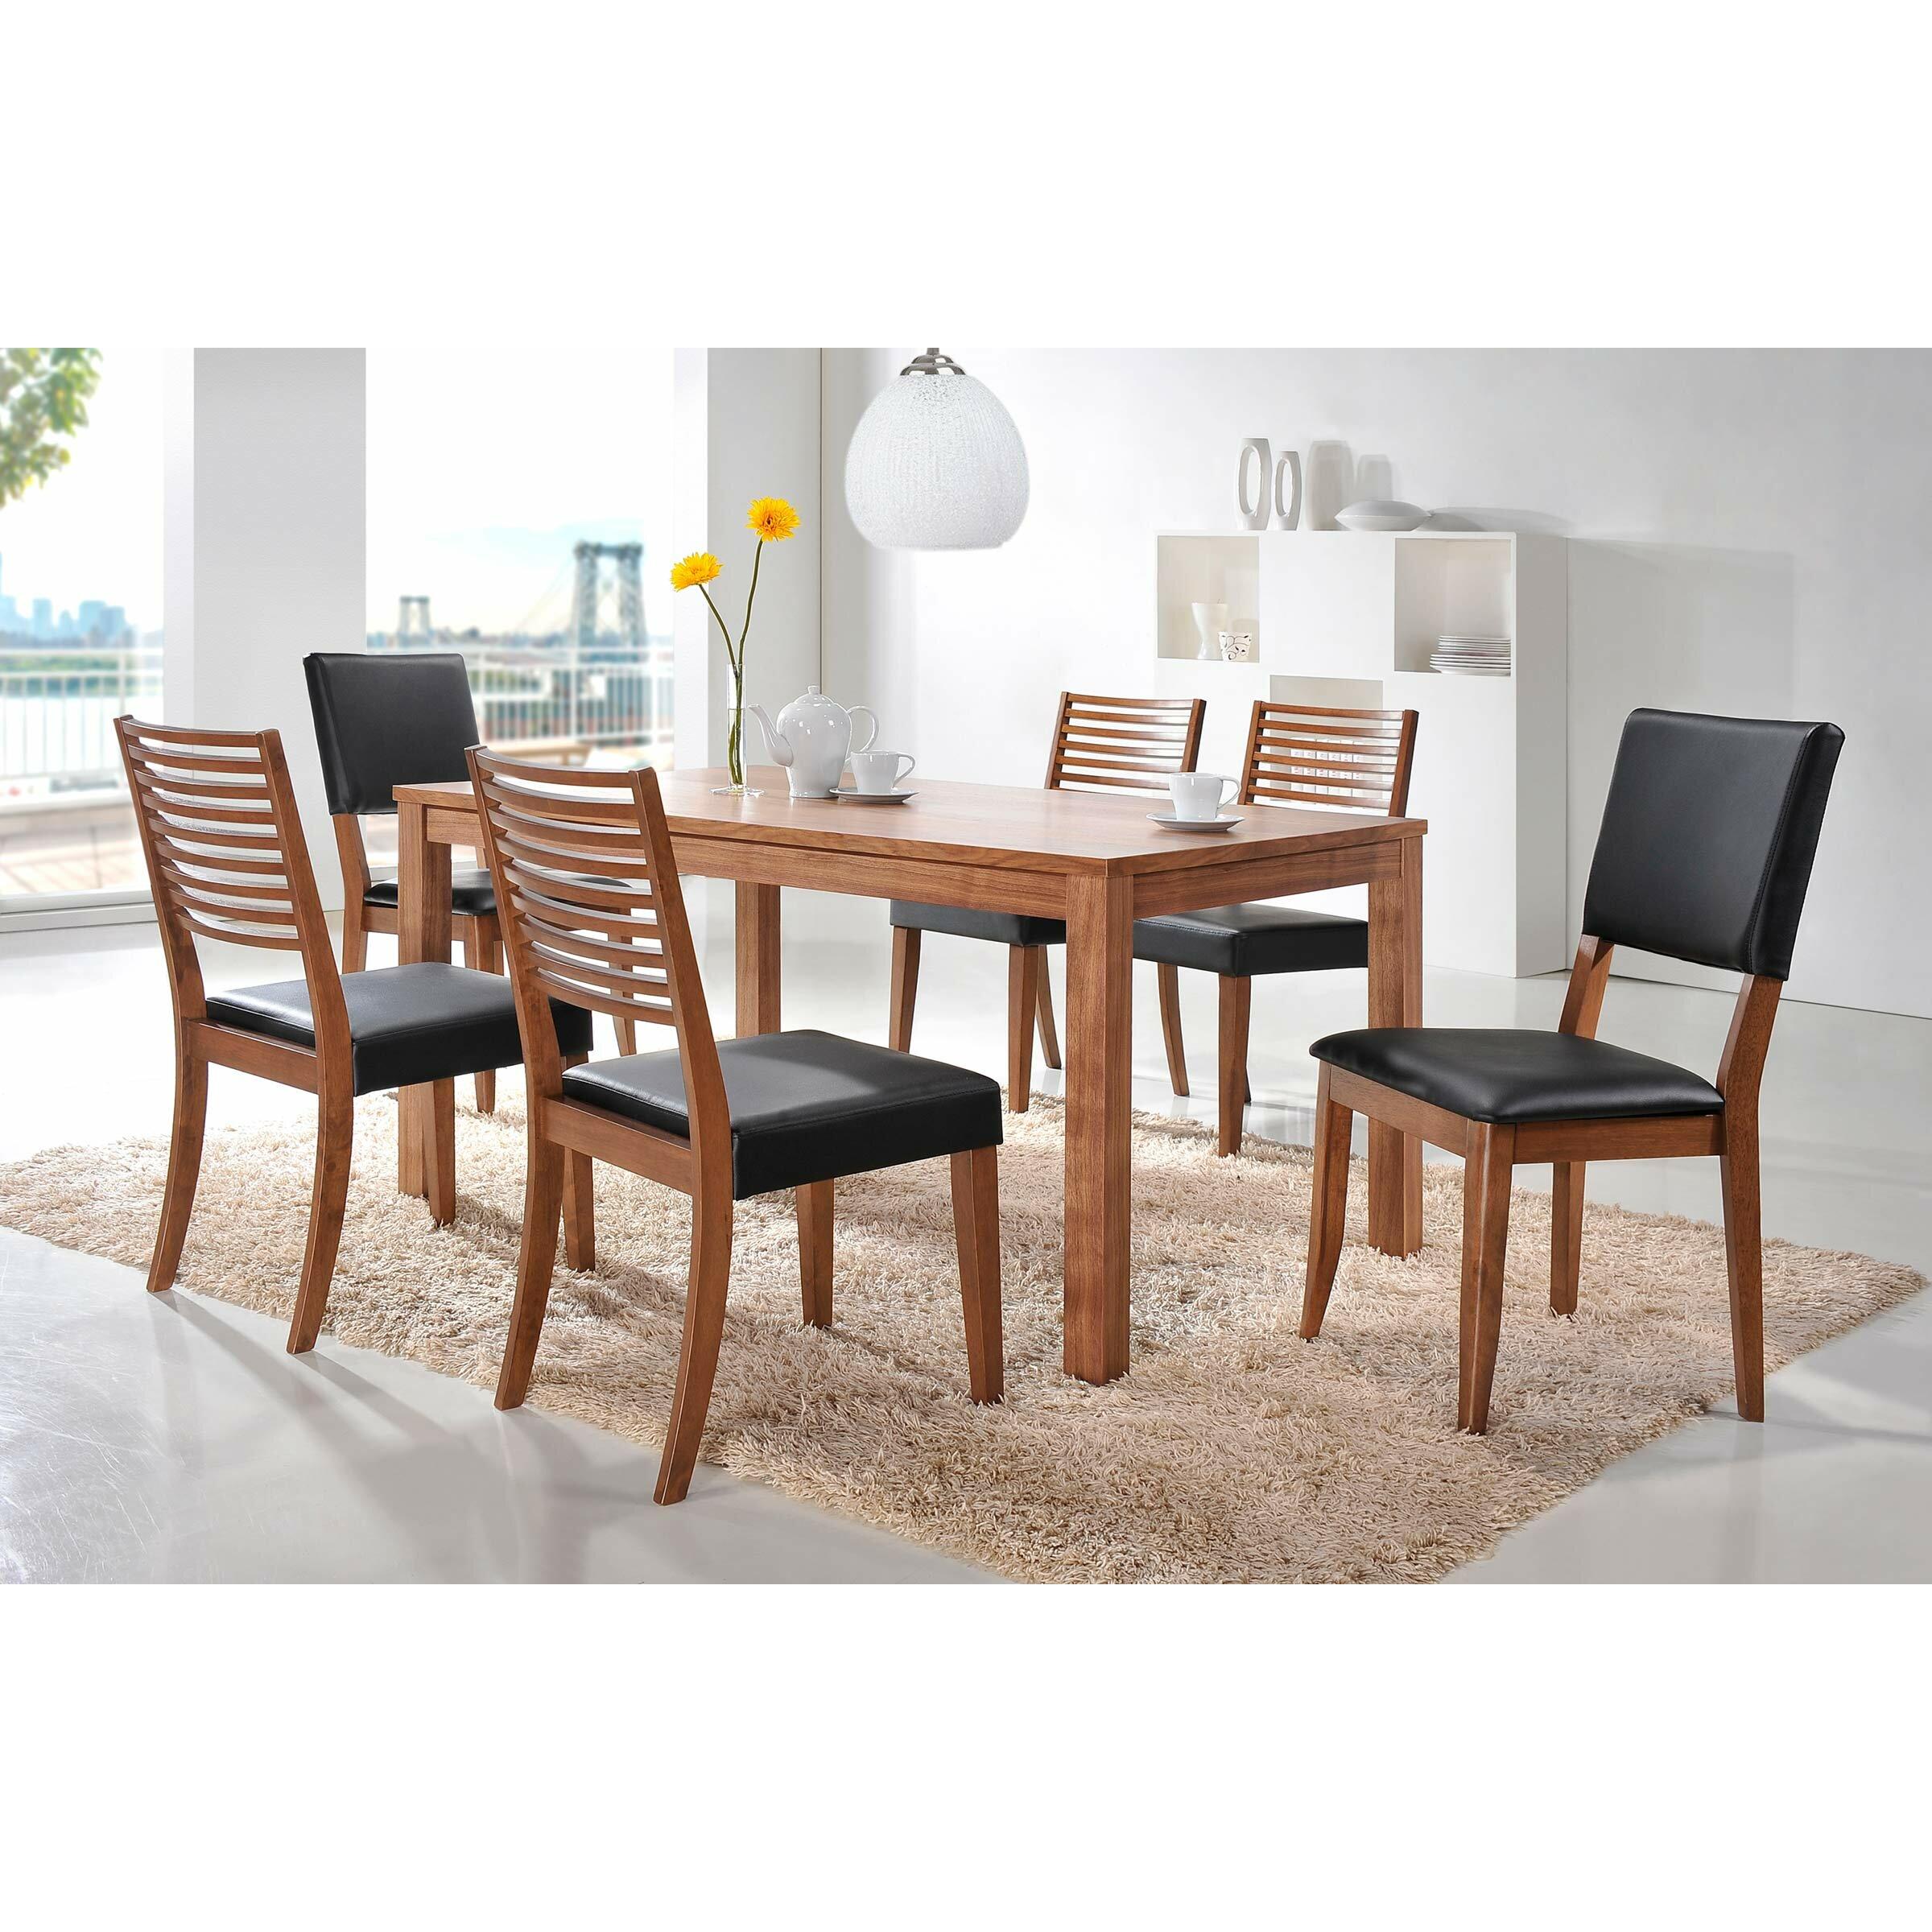 Brayden Studio Mcwhorter Dining Table Reviews: Brayden Studio Folmar Dining Table I & Reviews